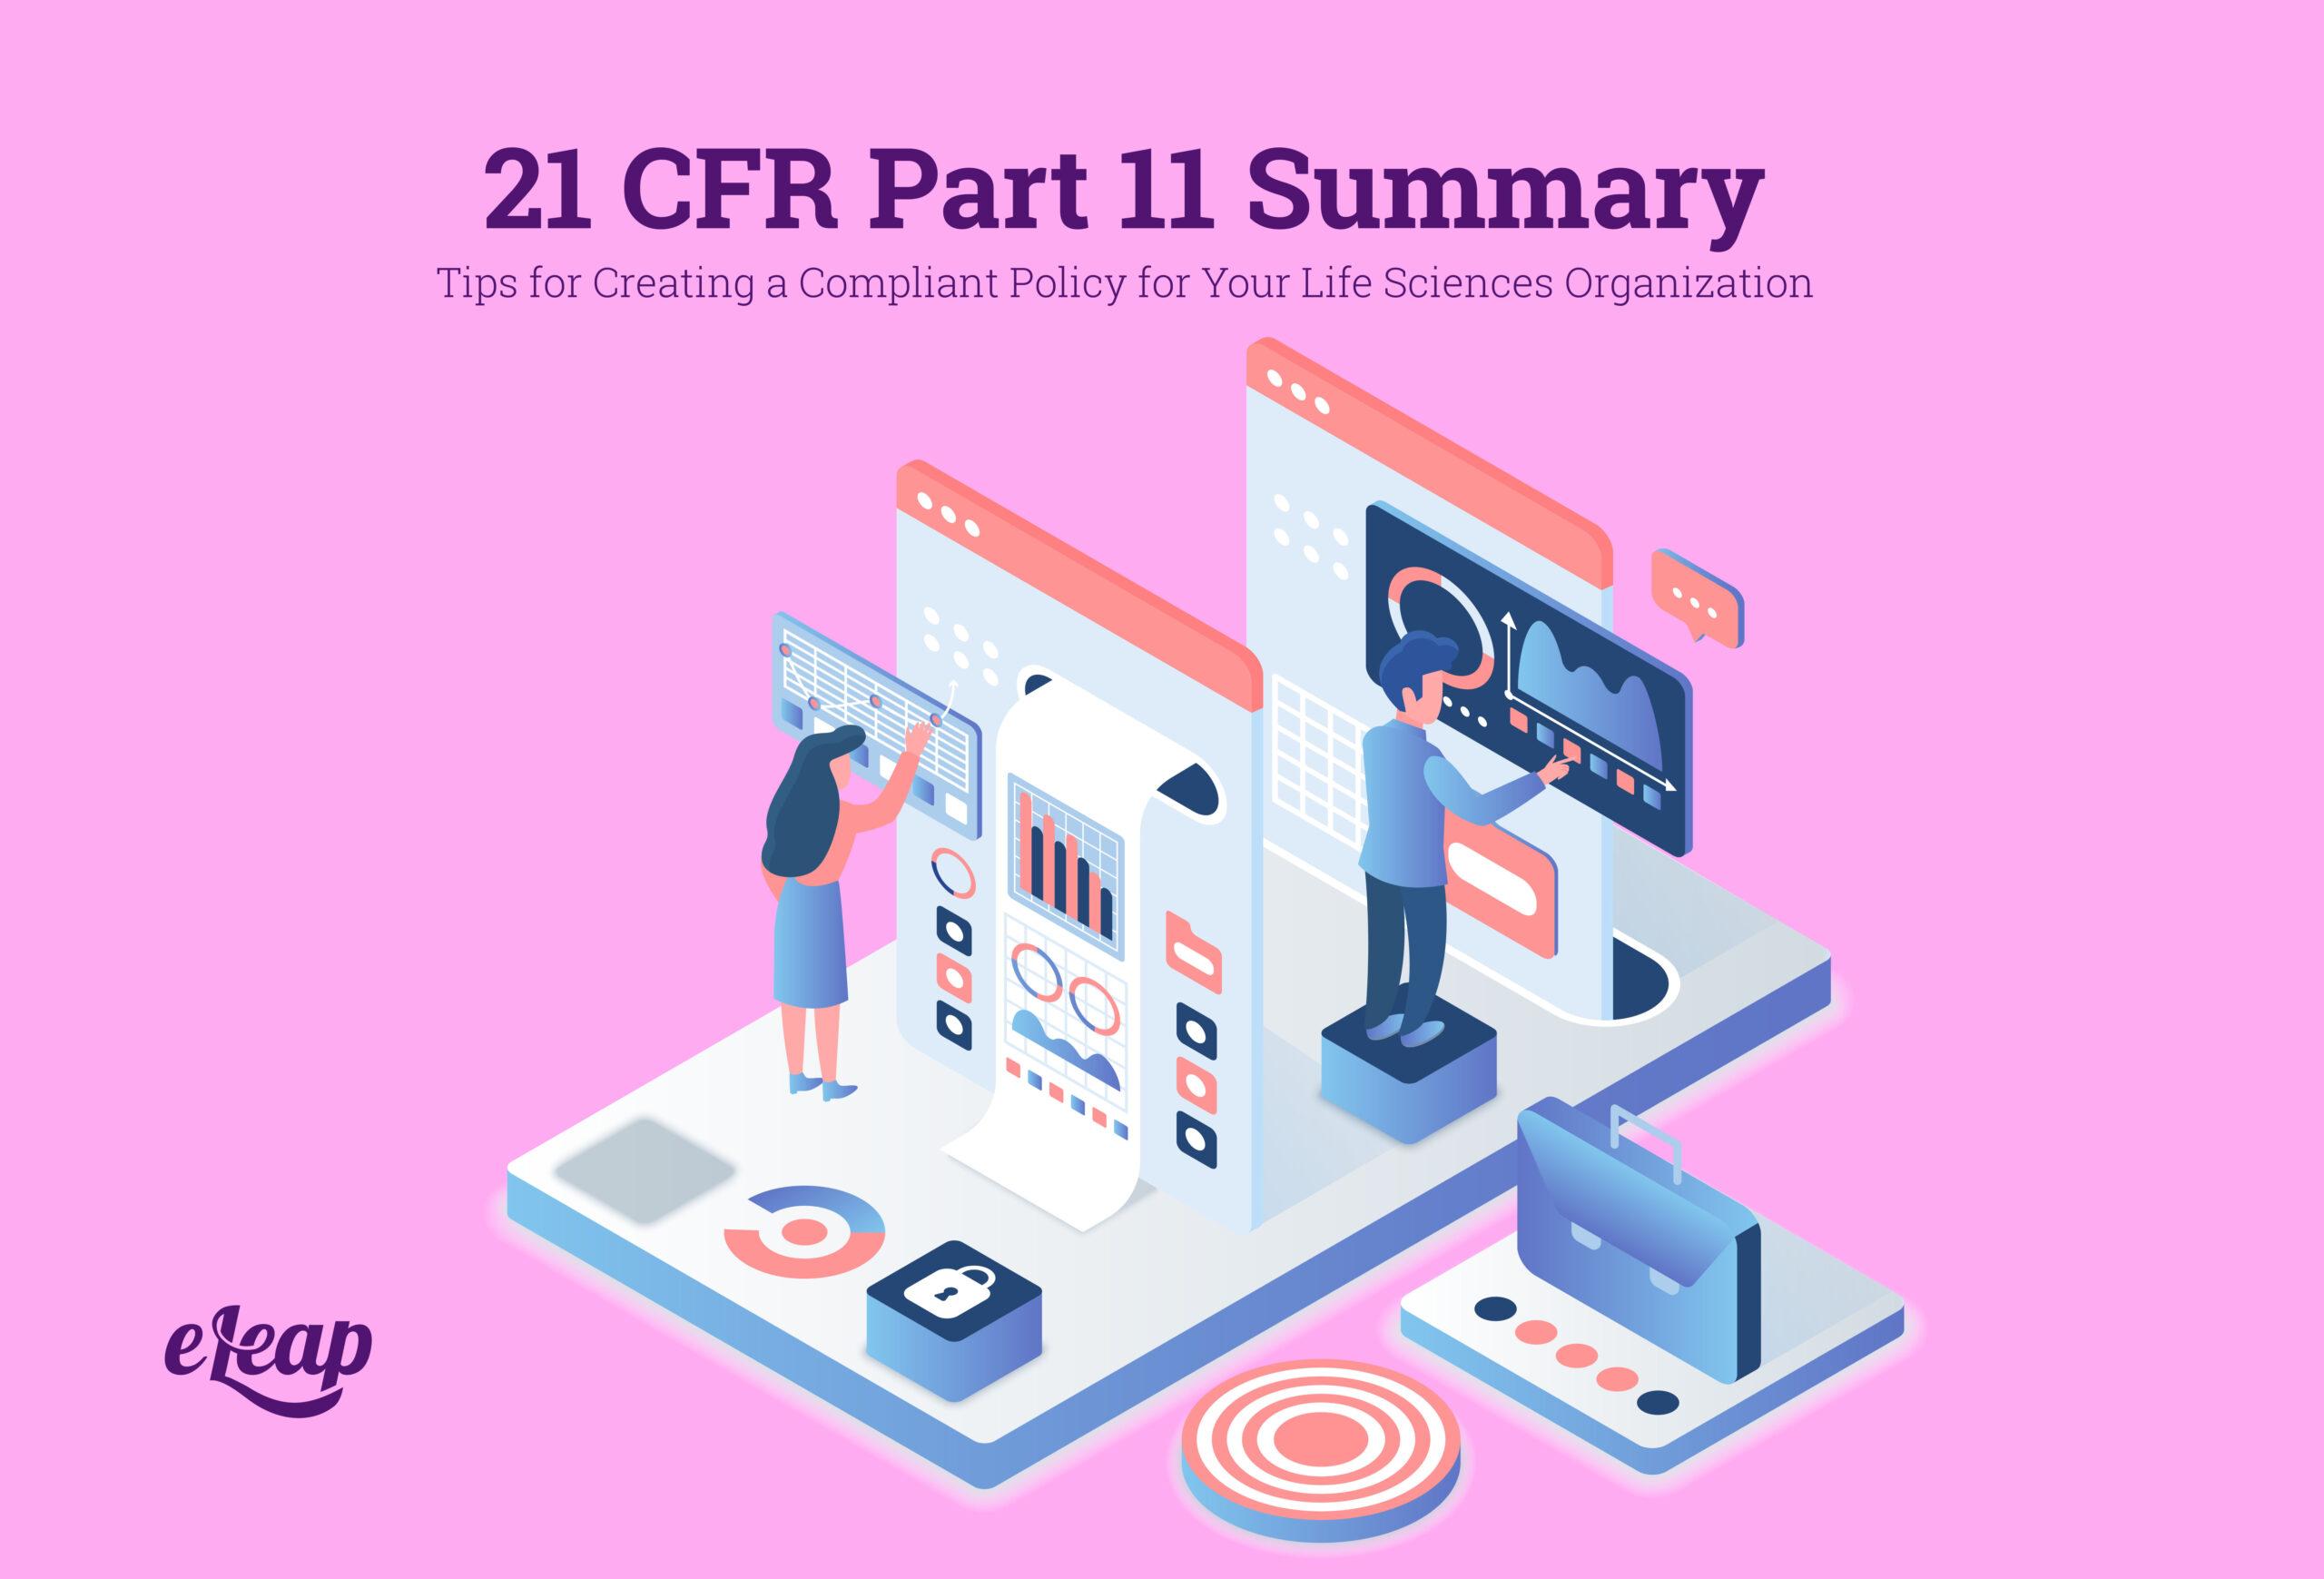 21 CFR Part 11 Summary